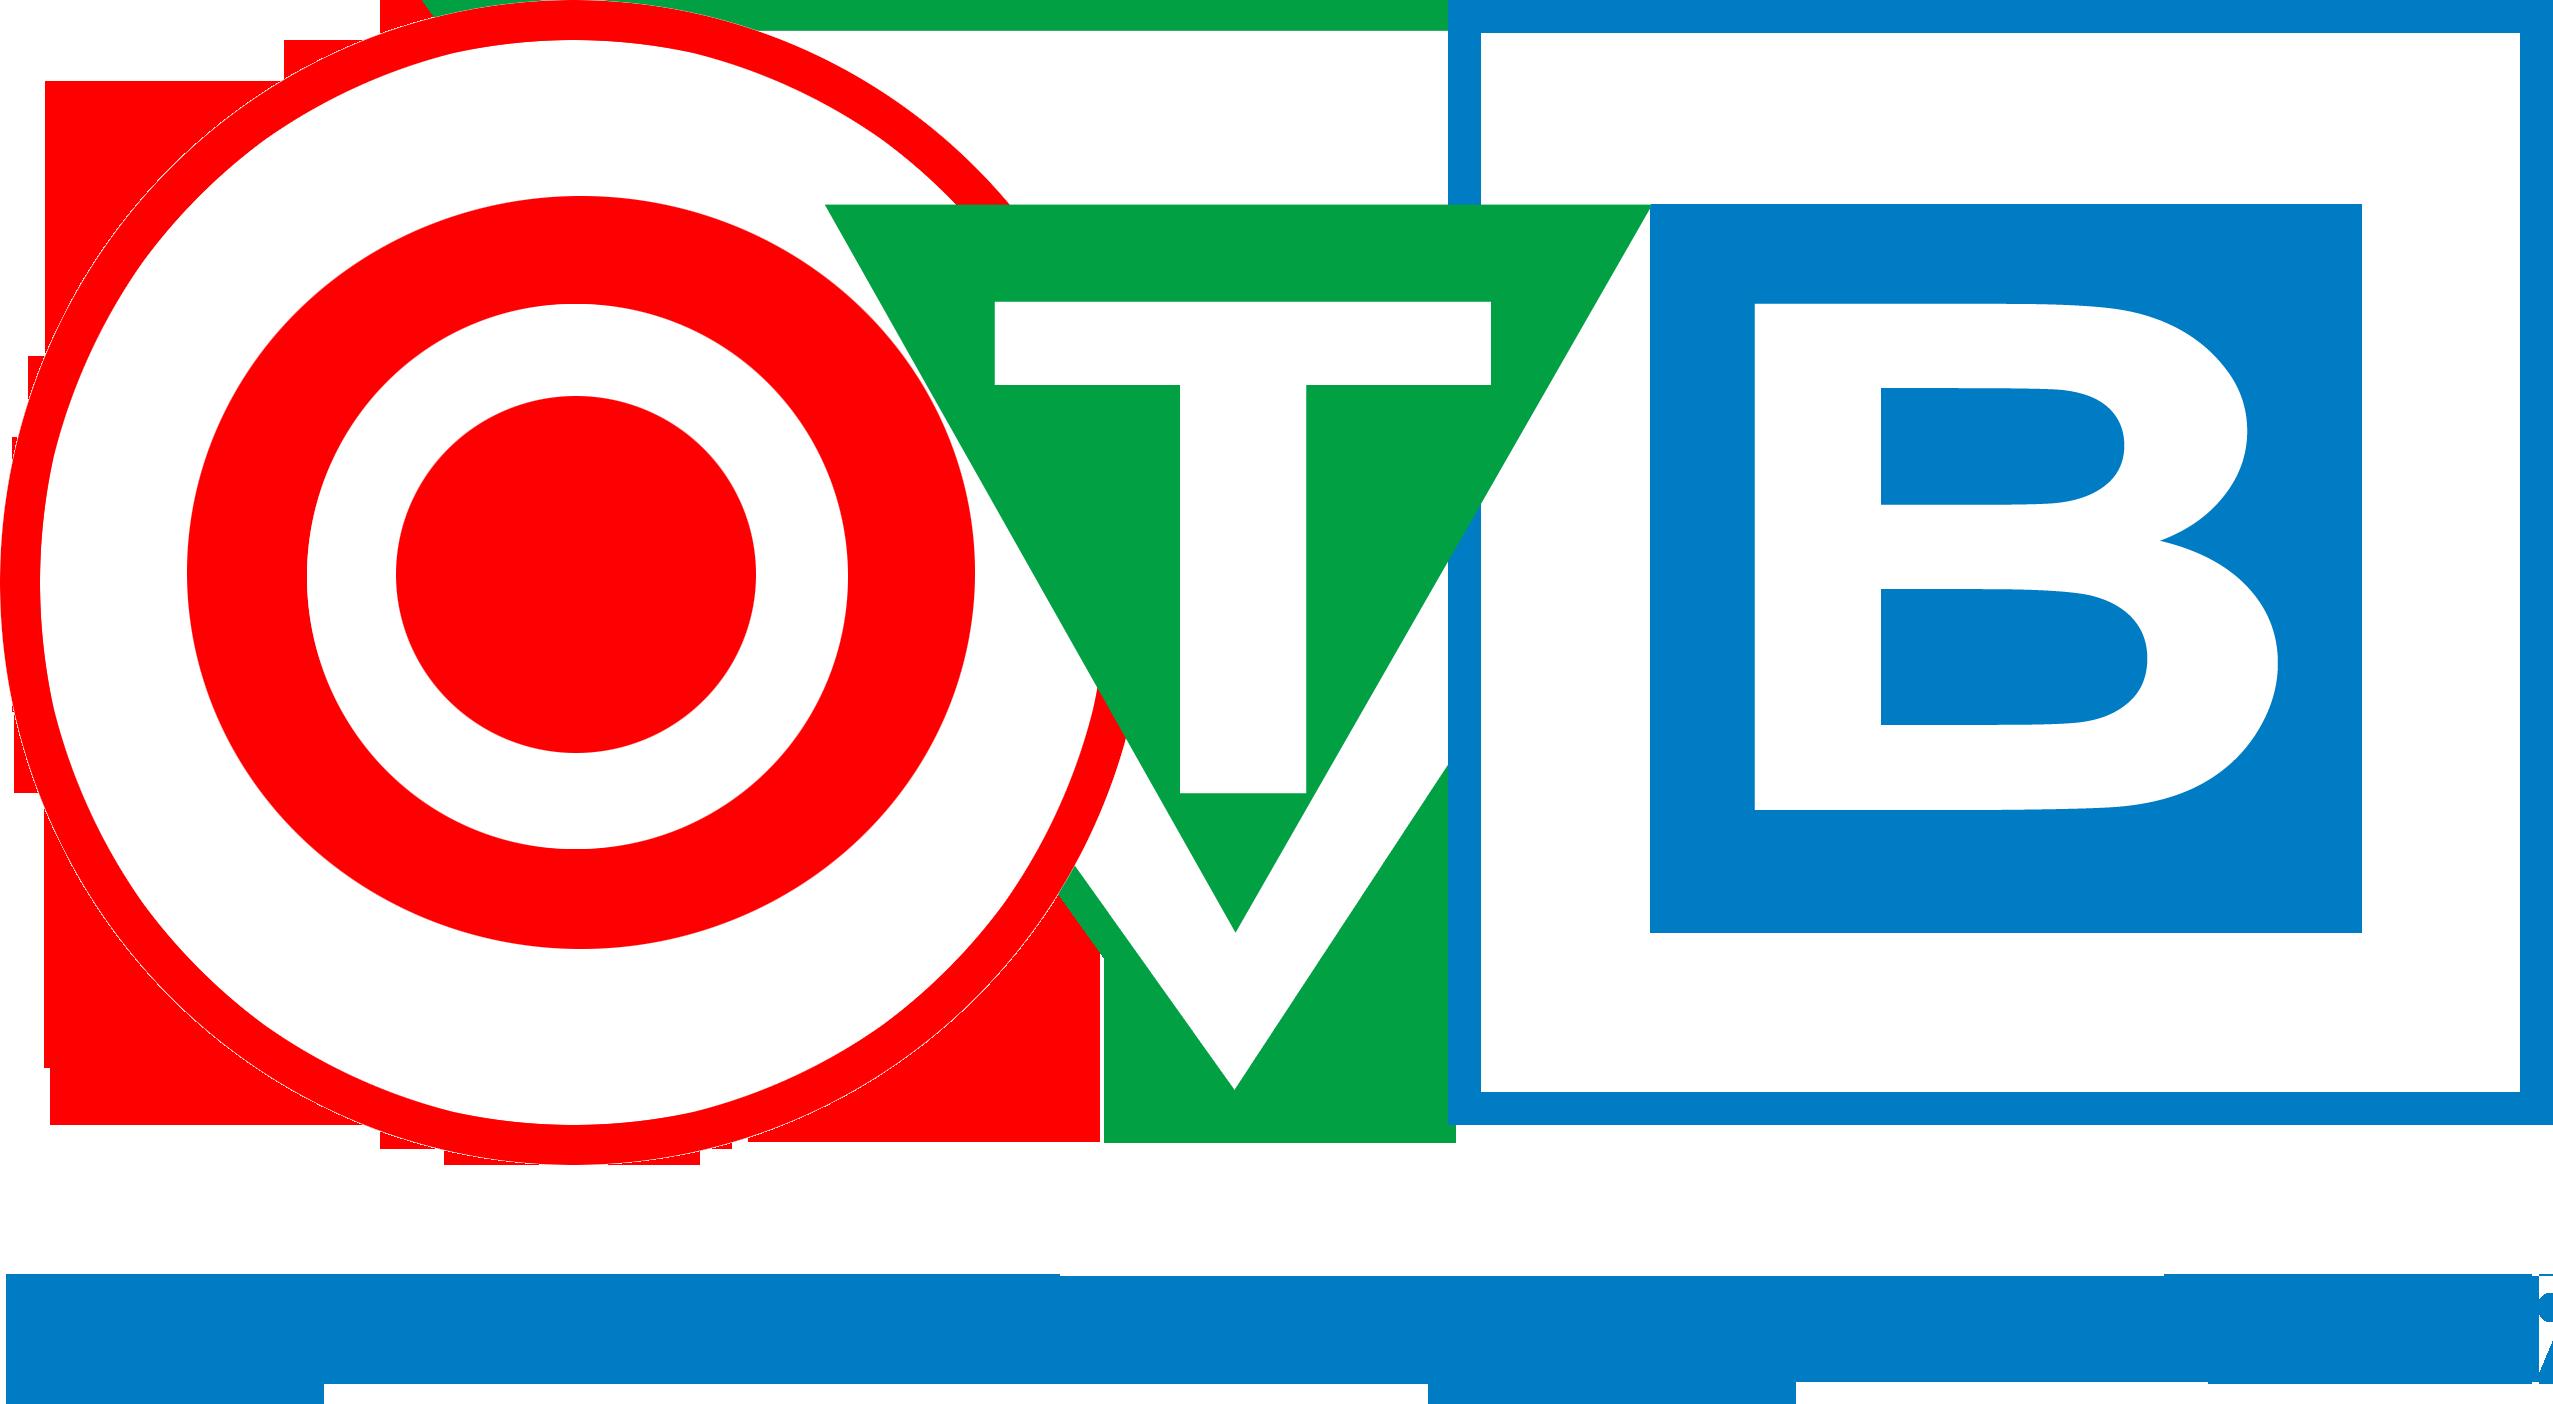 ОТВ (г. Владивосток) (2)